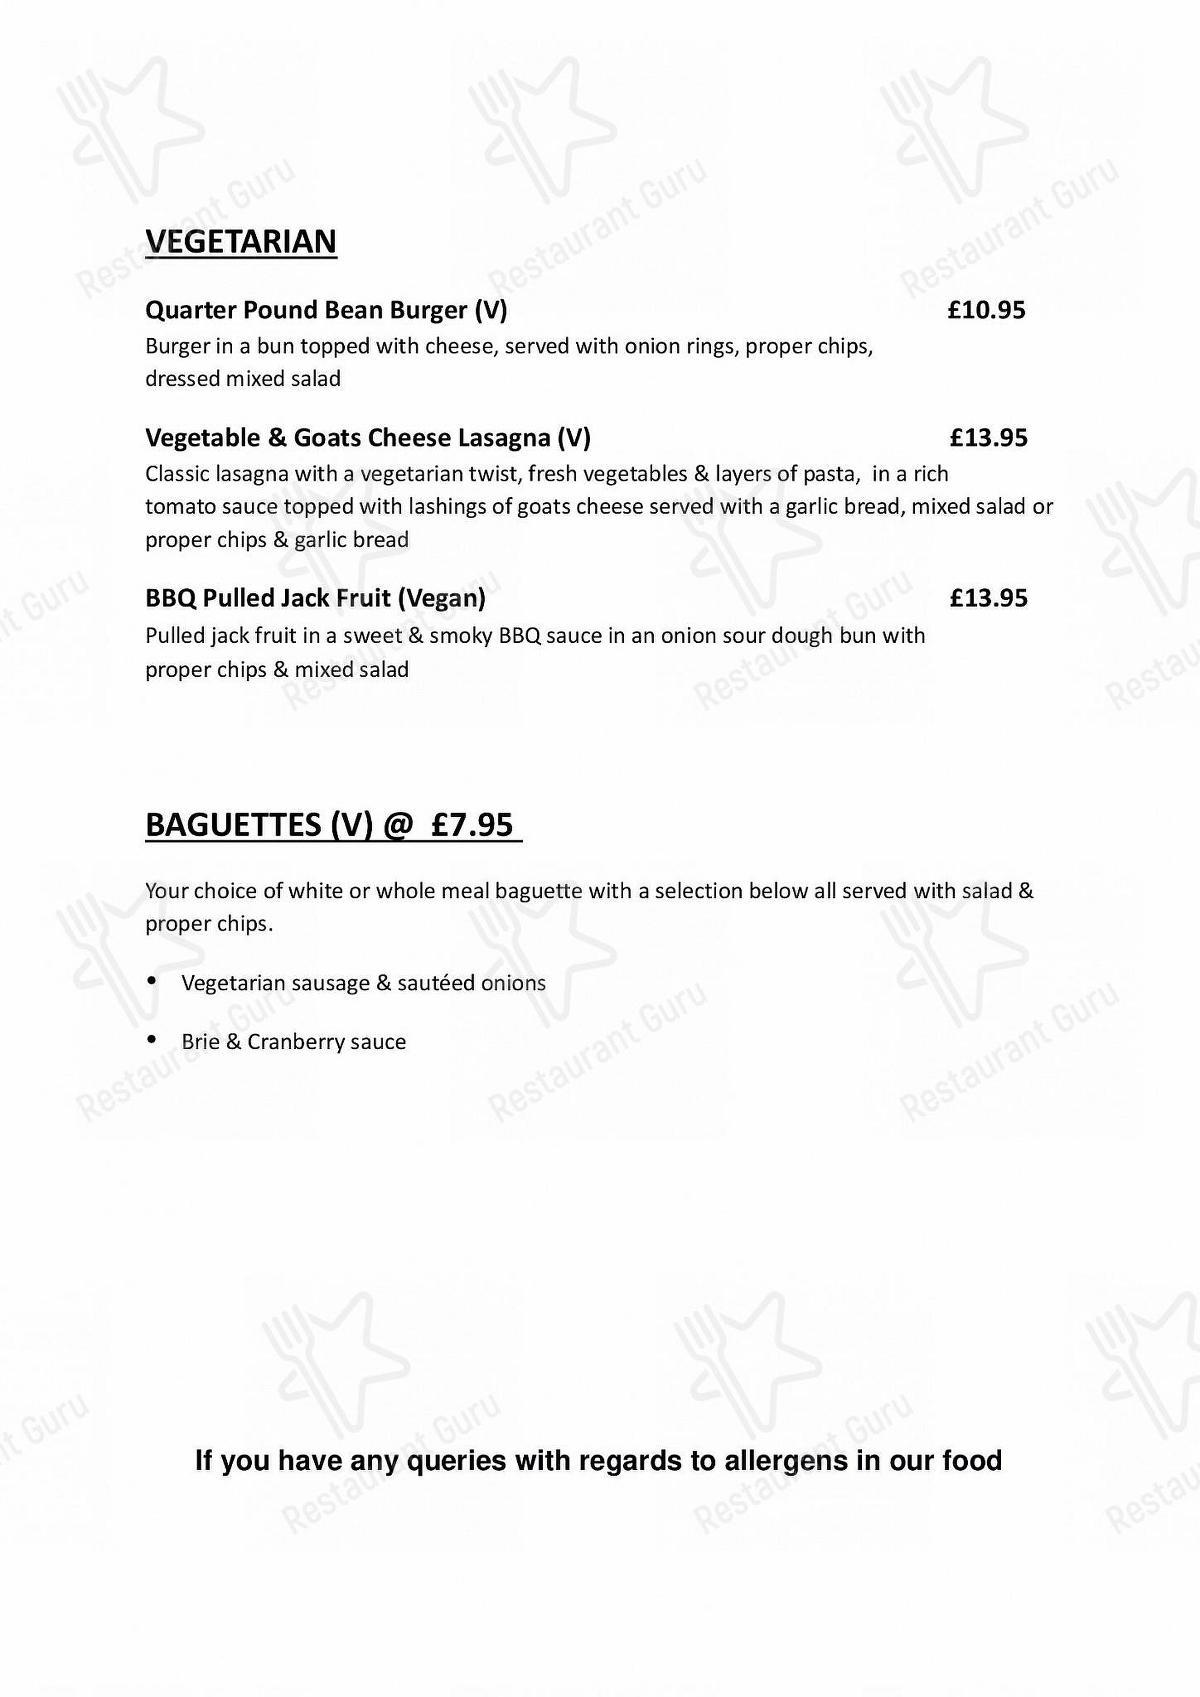 The George menu